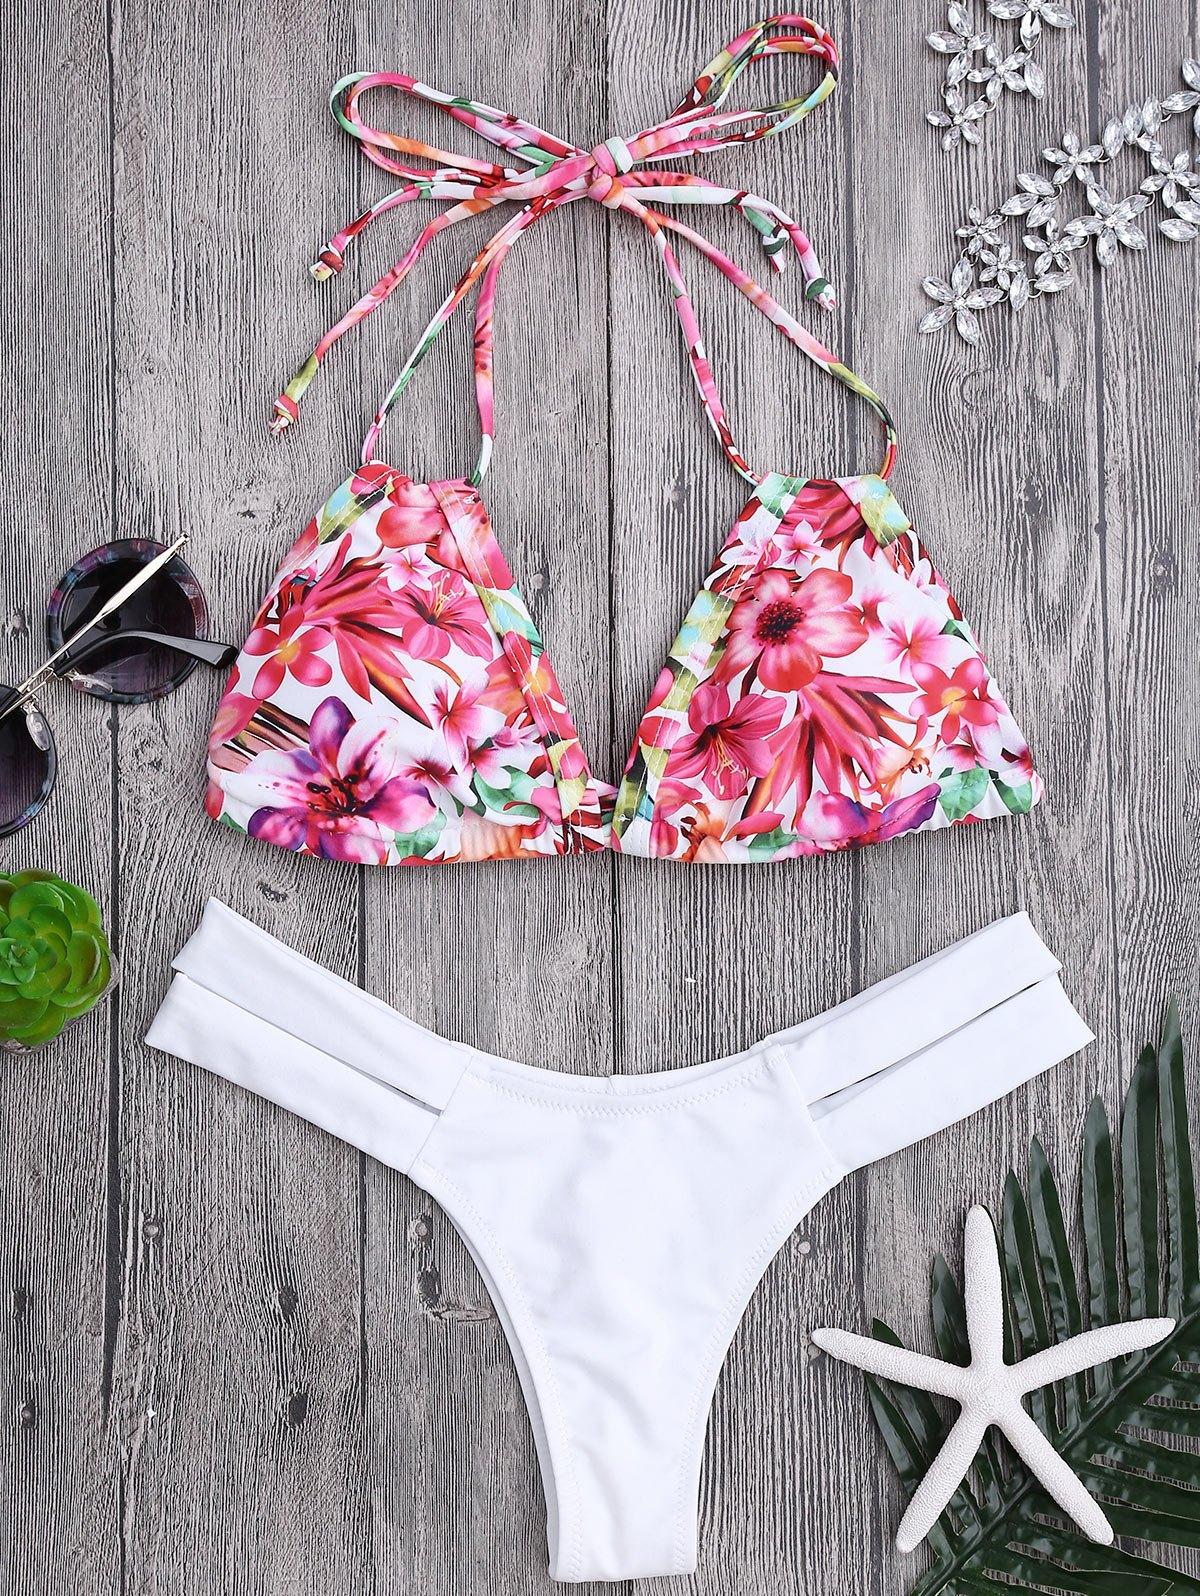 Floral Swim Top and Bandage Thong Bikini bottoms, White